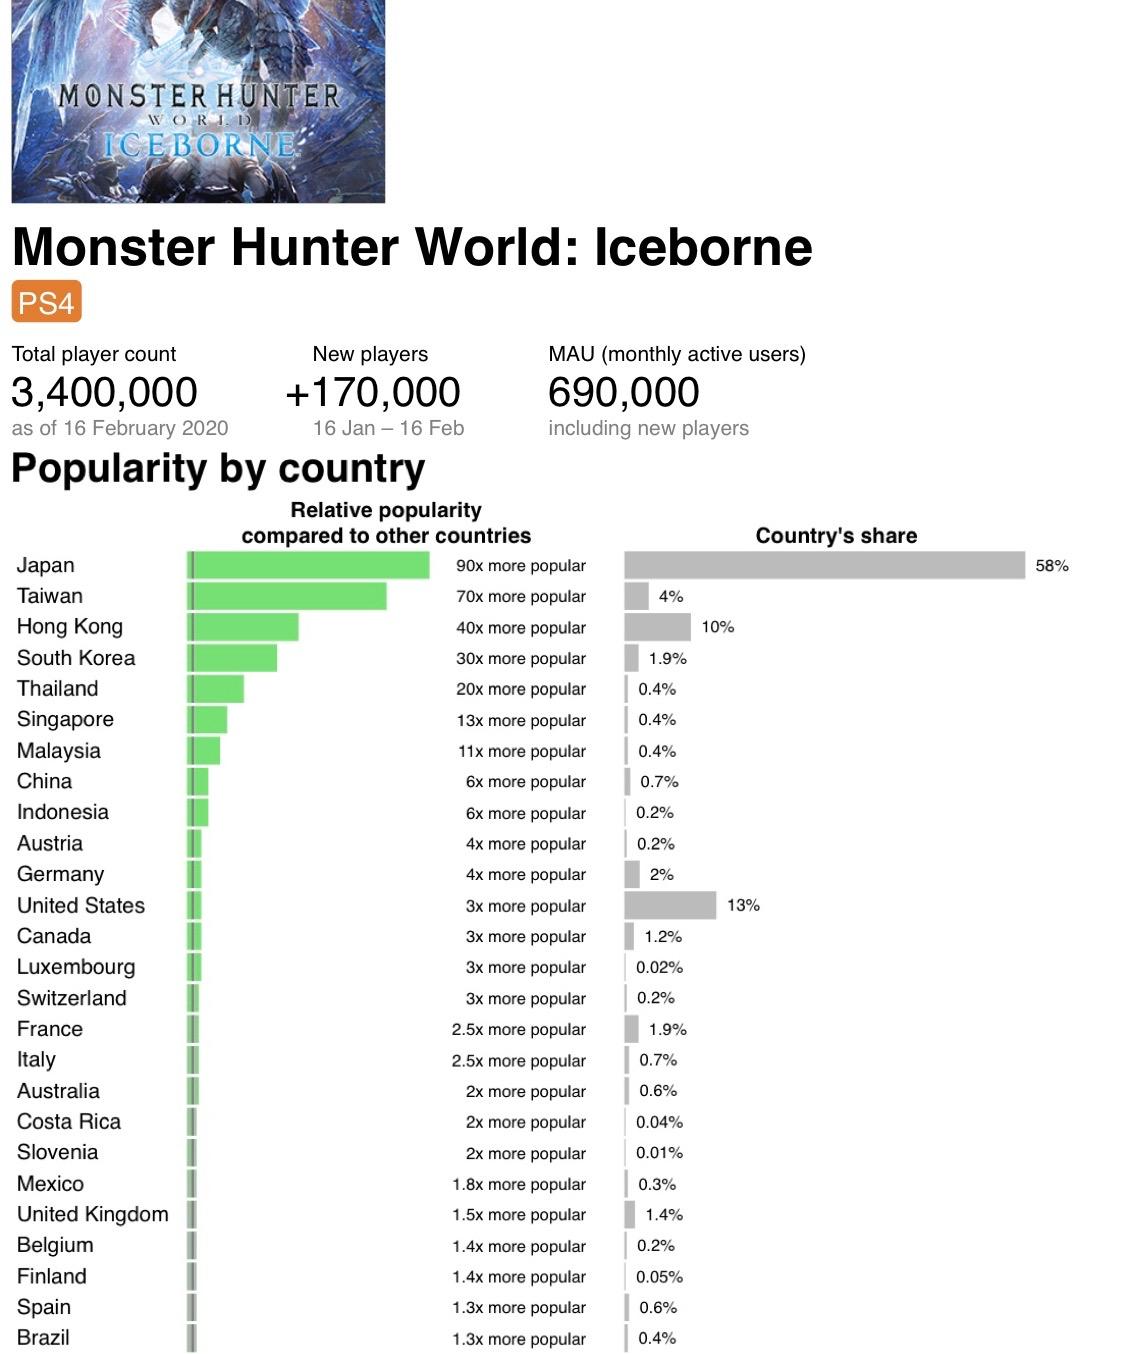 L5FDcLe - 『モンスターハンターワールド:アイスボーン』、累計500万本突破!